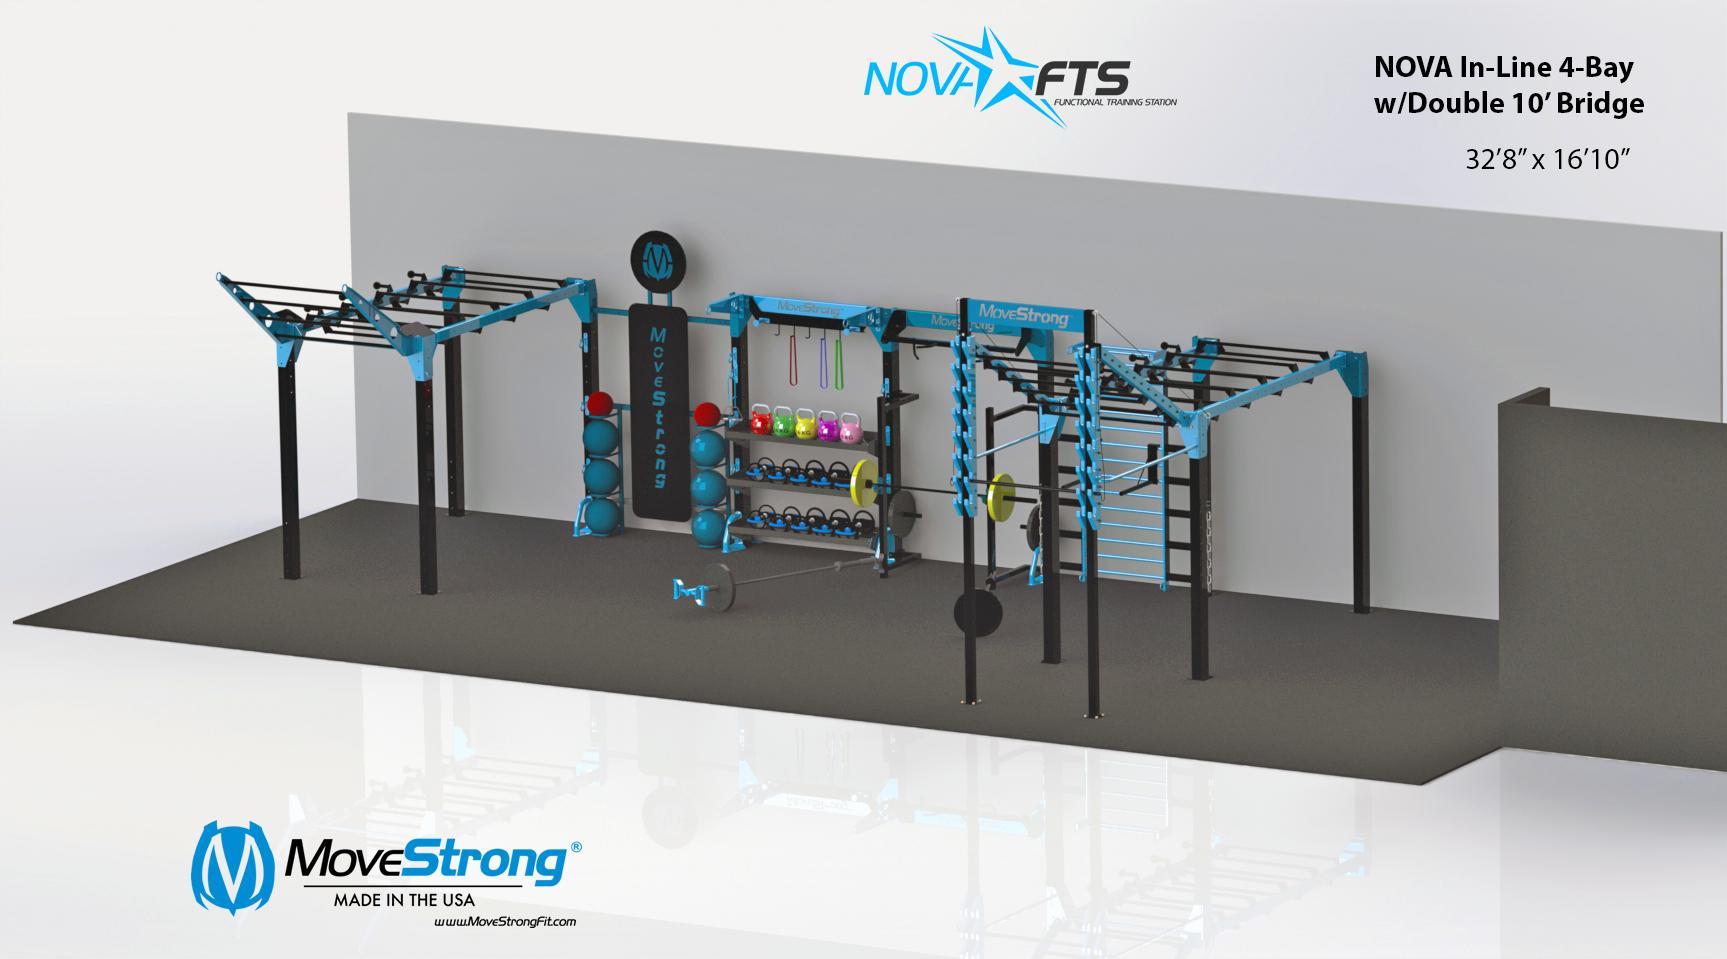 Nova 4-bay-in-line-dual Bridge_Plant Based Fitness - 3.png